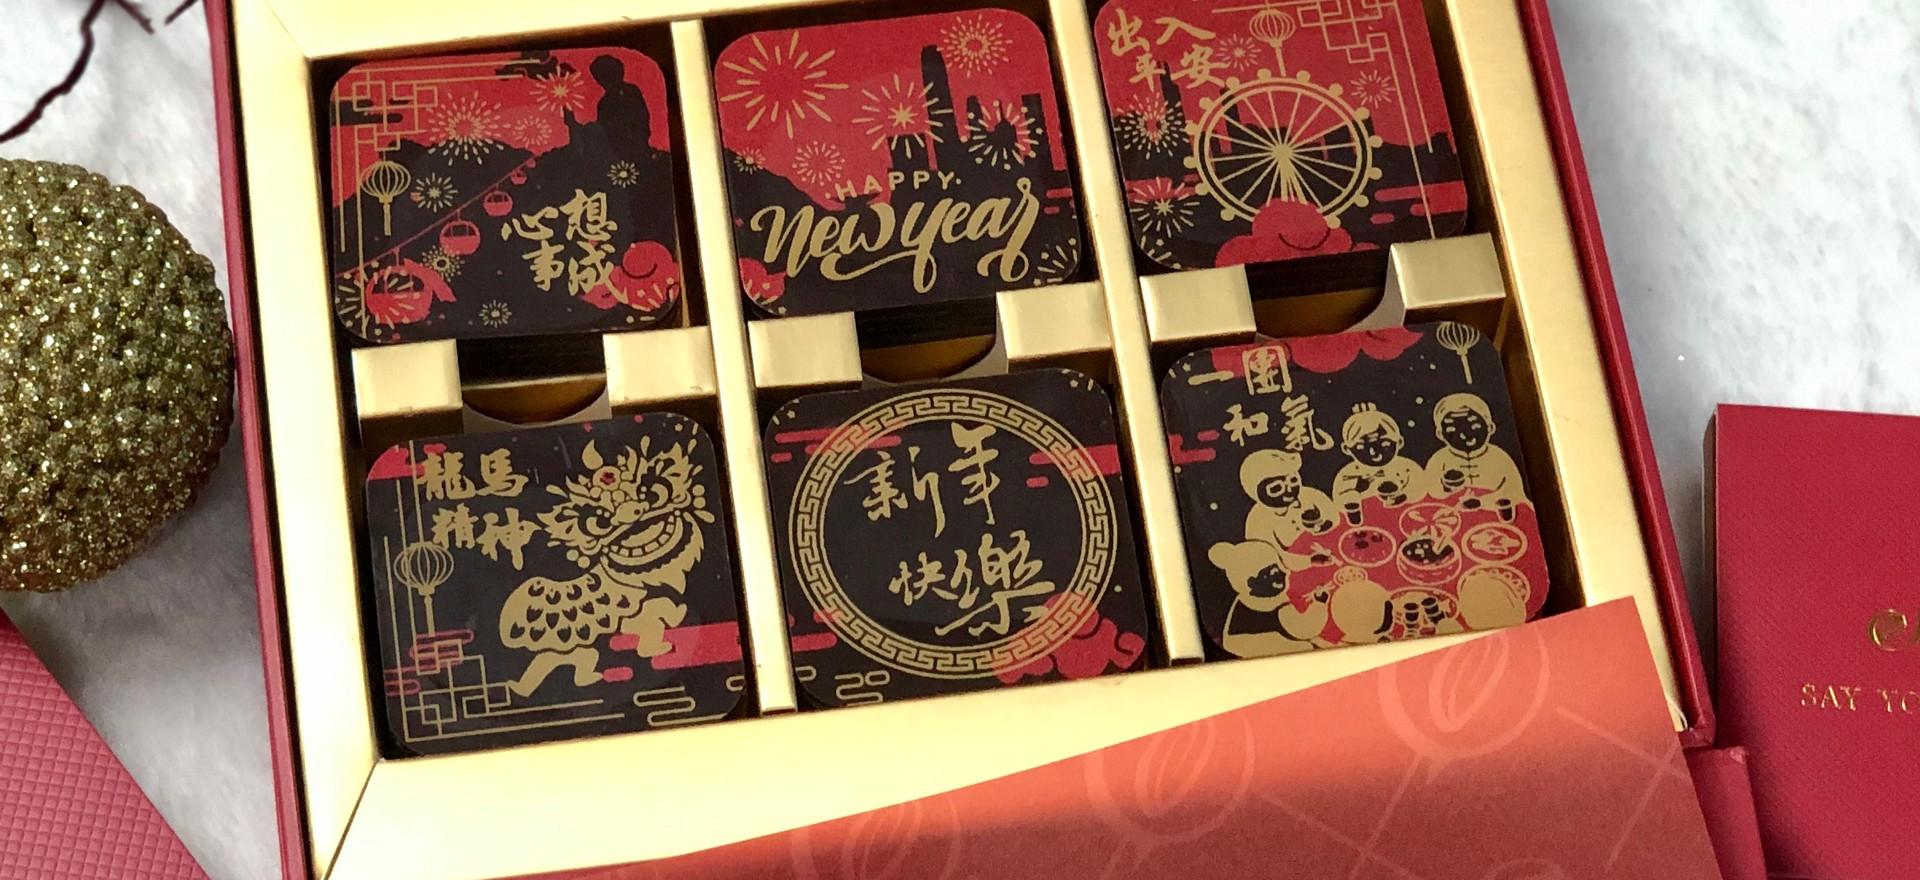 HK Features tablets (24pcs per set)